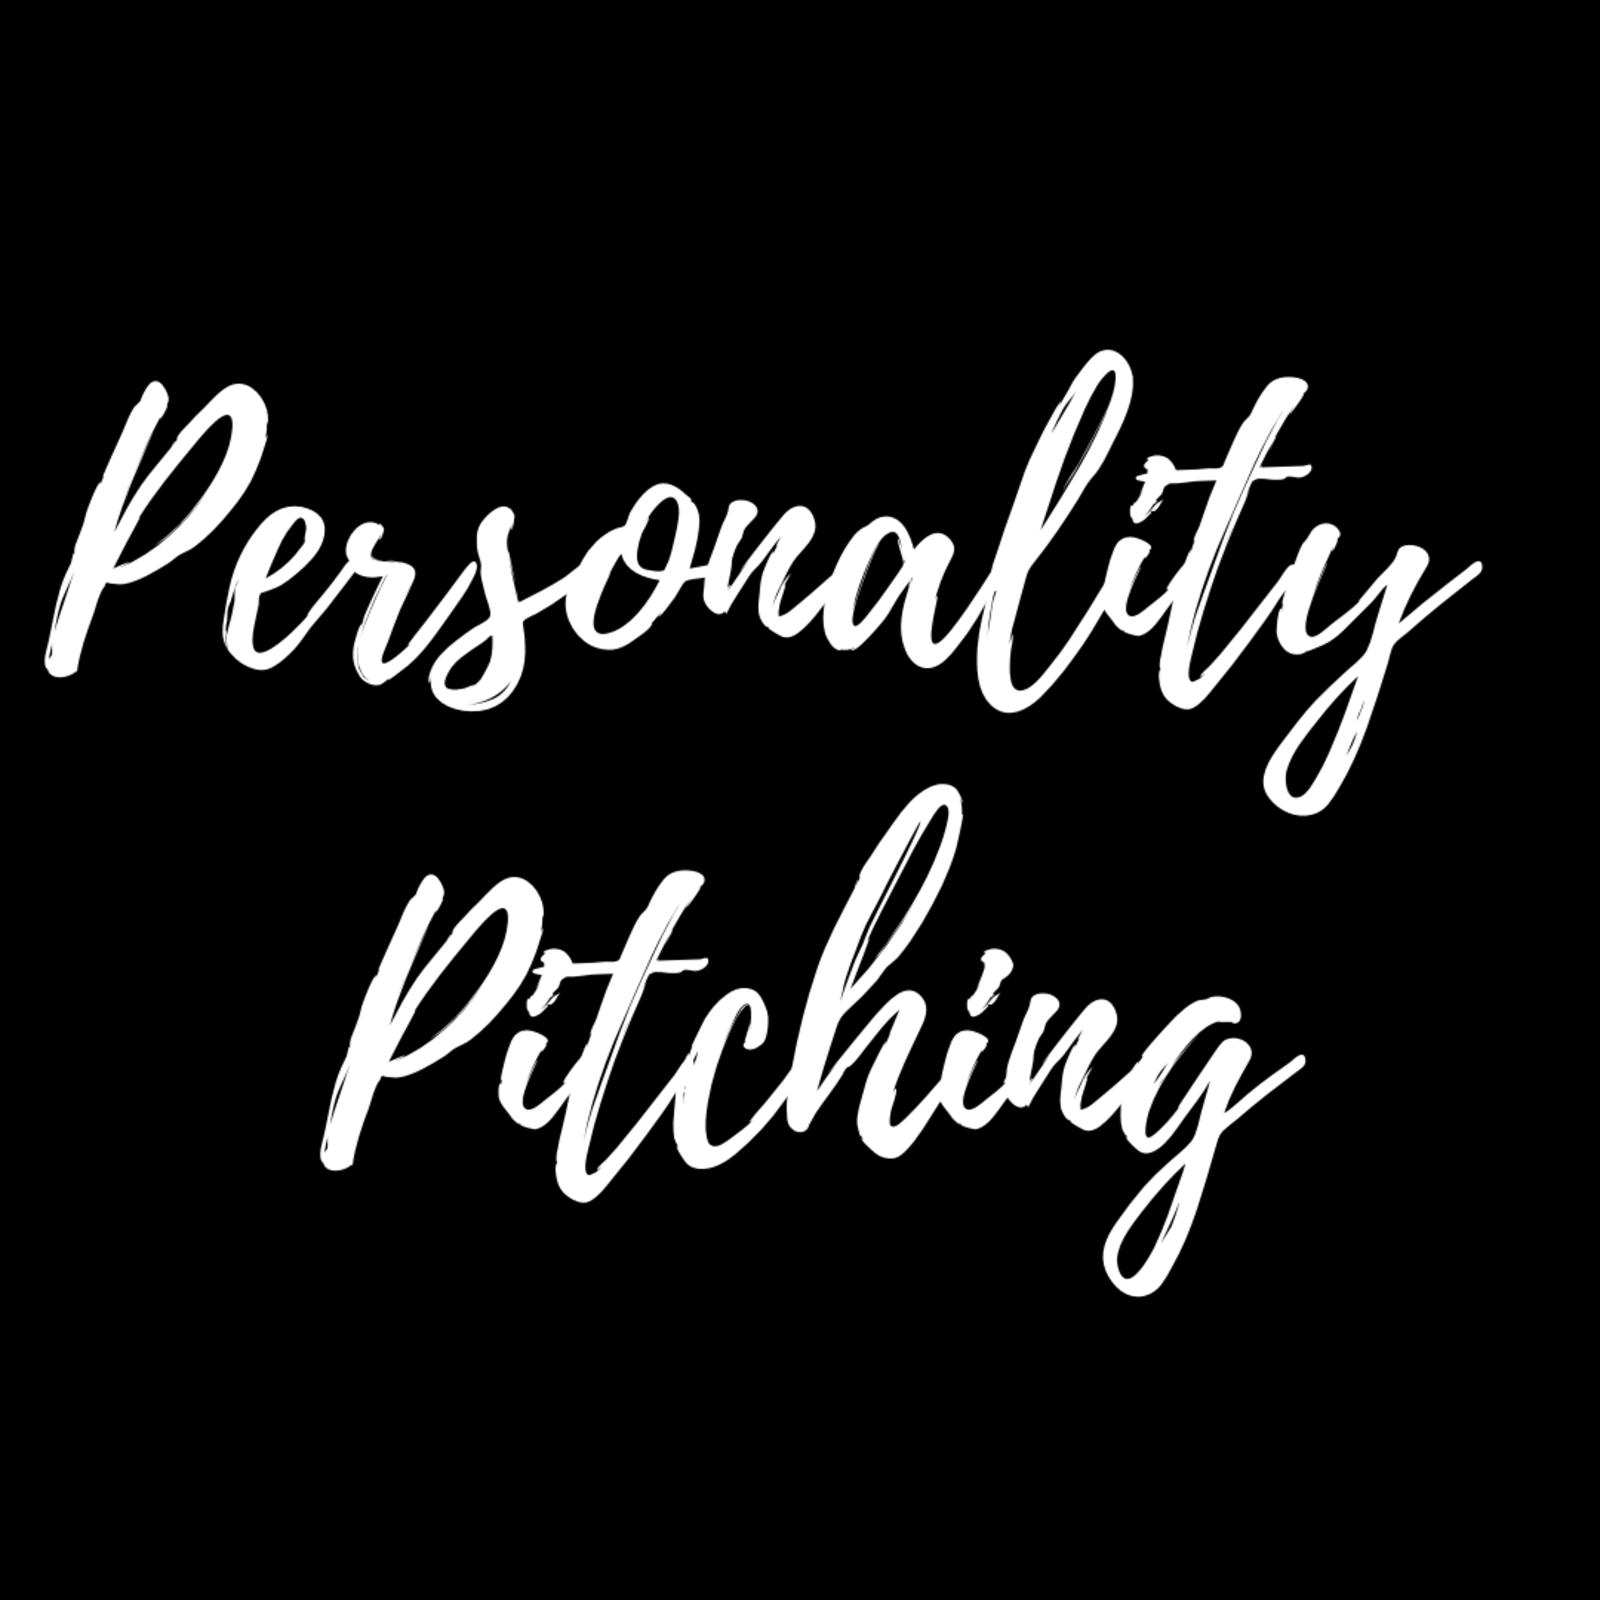 Personality Pitching